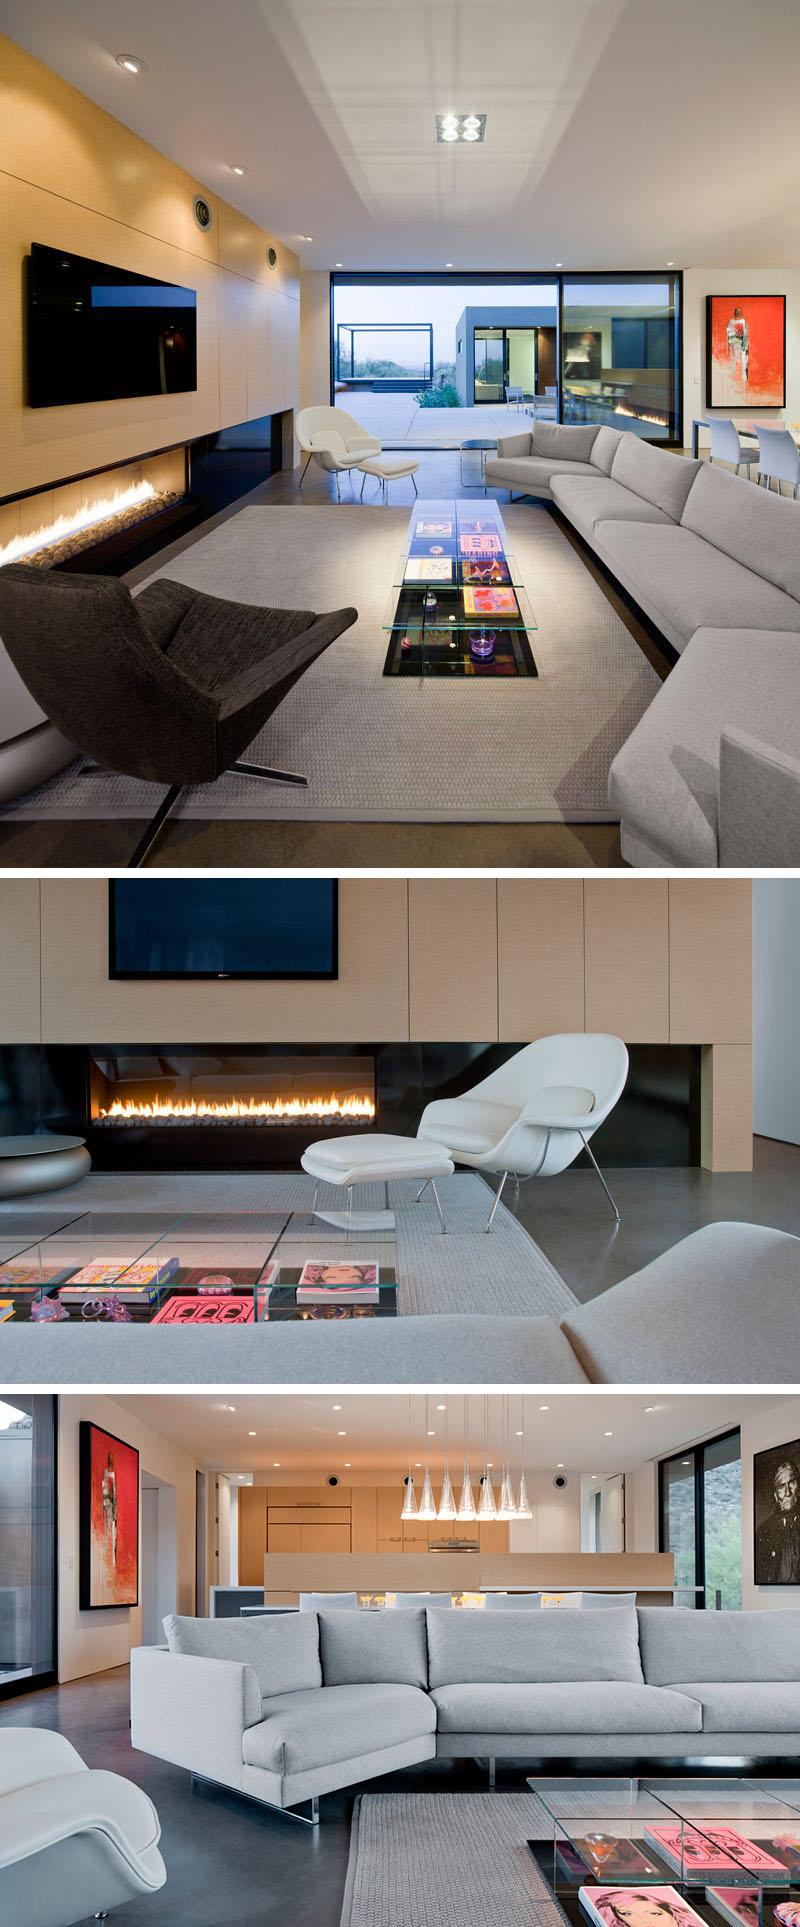 modern-living-room-fireplace-141116-420-04